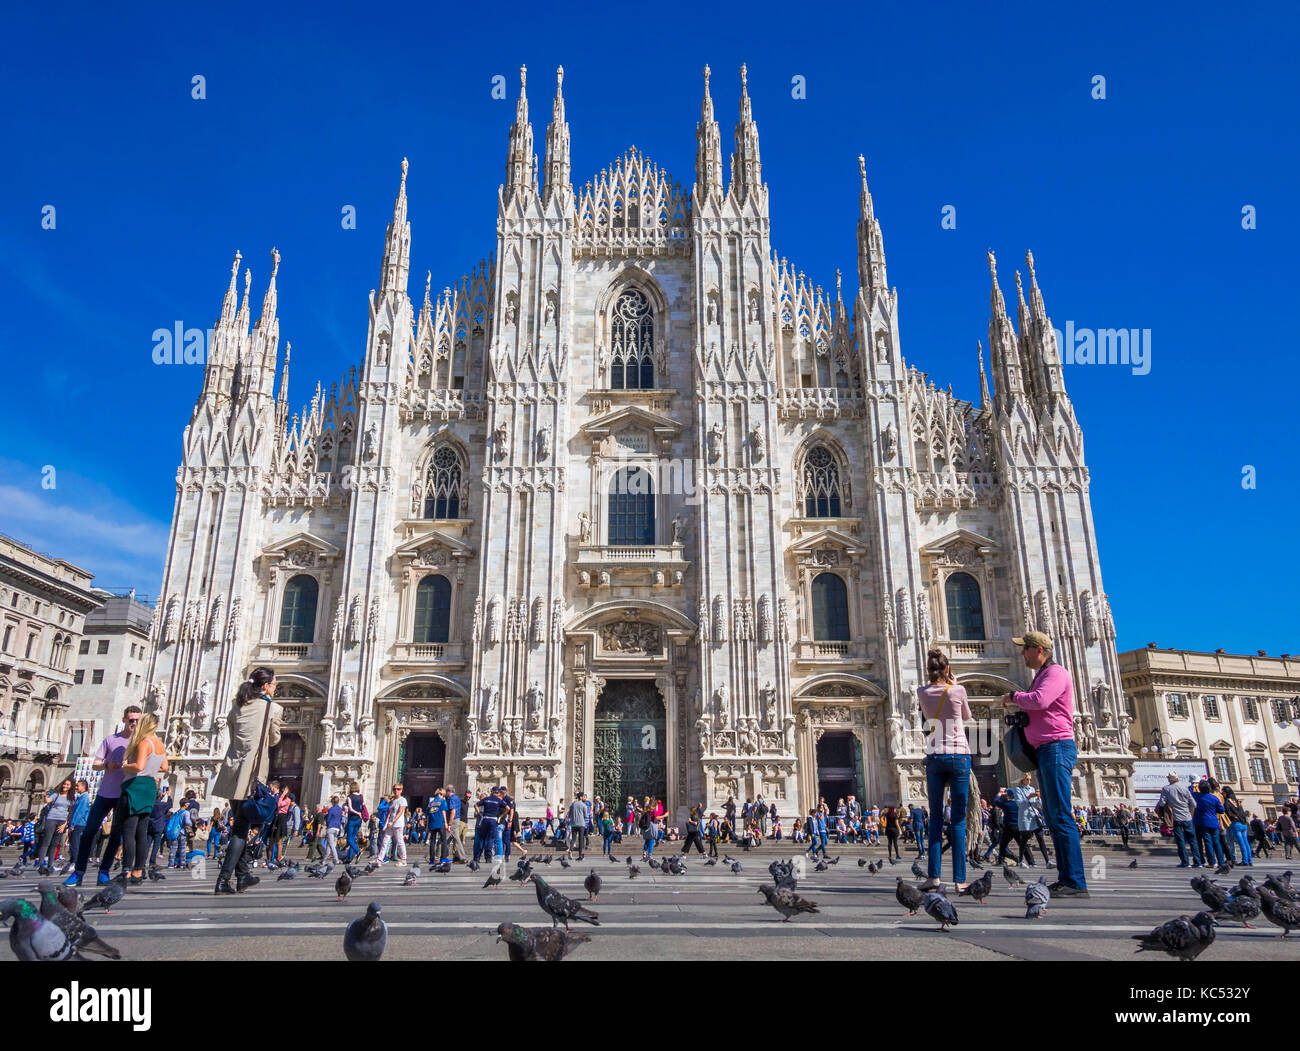 Piazza del Duomo, Milan, Milano, Lombardy, Italy, Europe - Stock Image